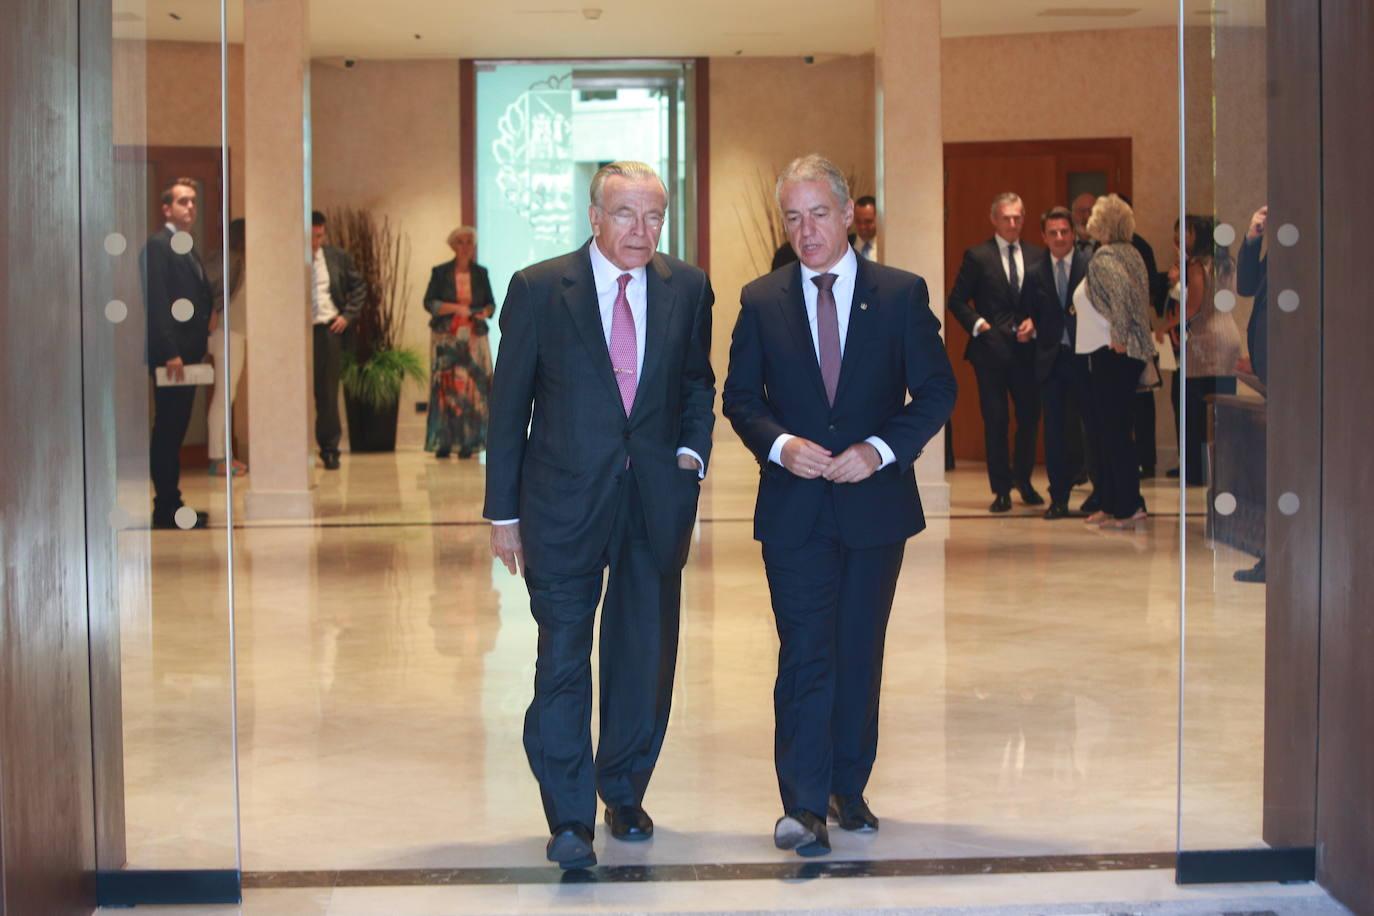 La Caixa destinará 11,5 millones de euros a su obra social en Euskadi